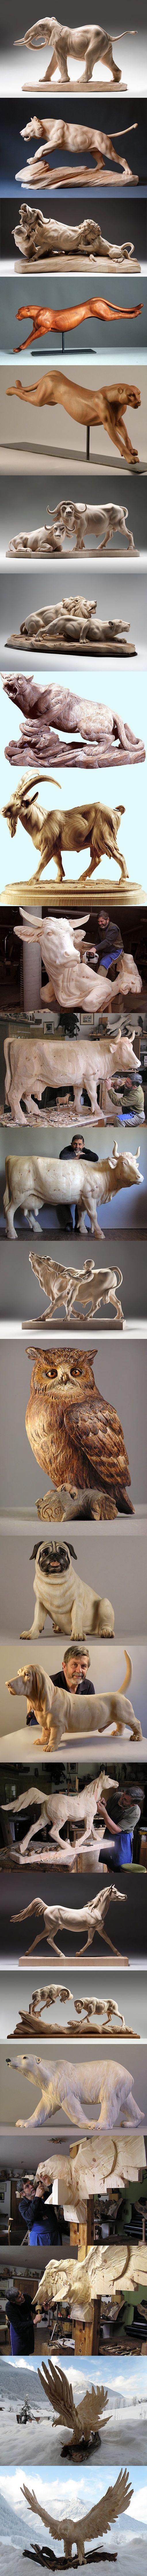 Amazing Wooden Sculptures by Italian Artist Giuseppe Rumerio